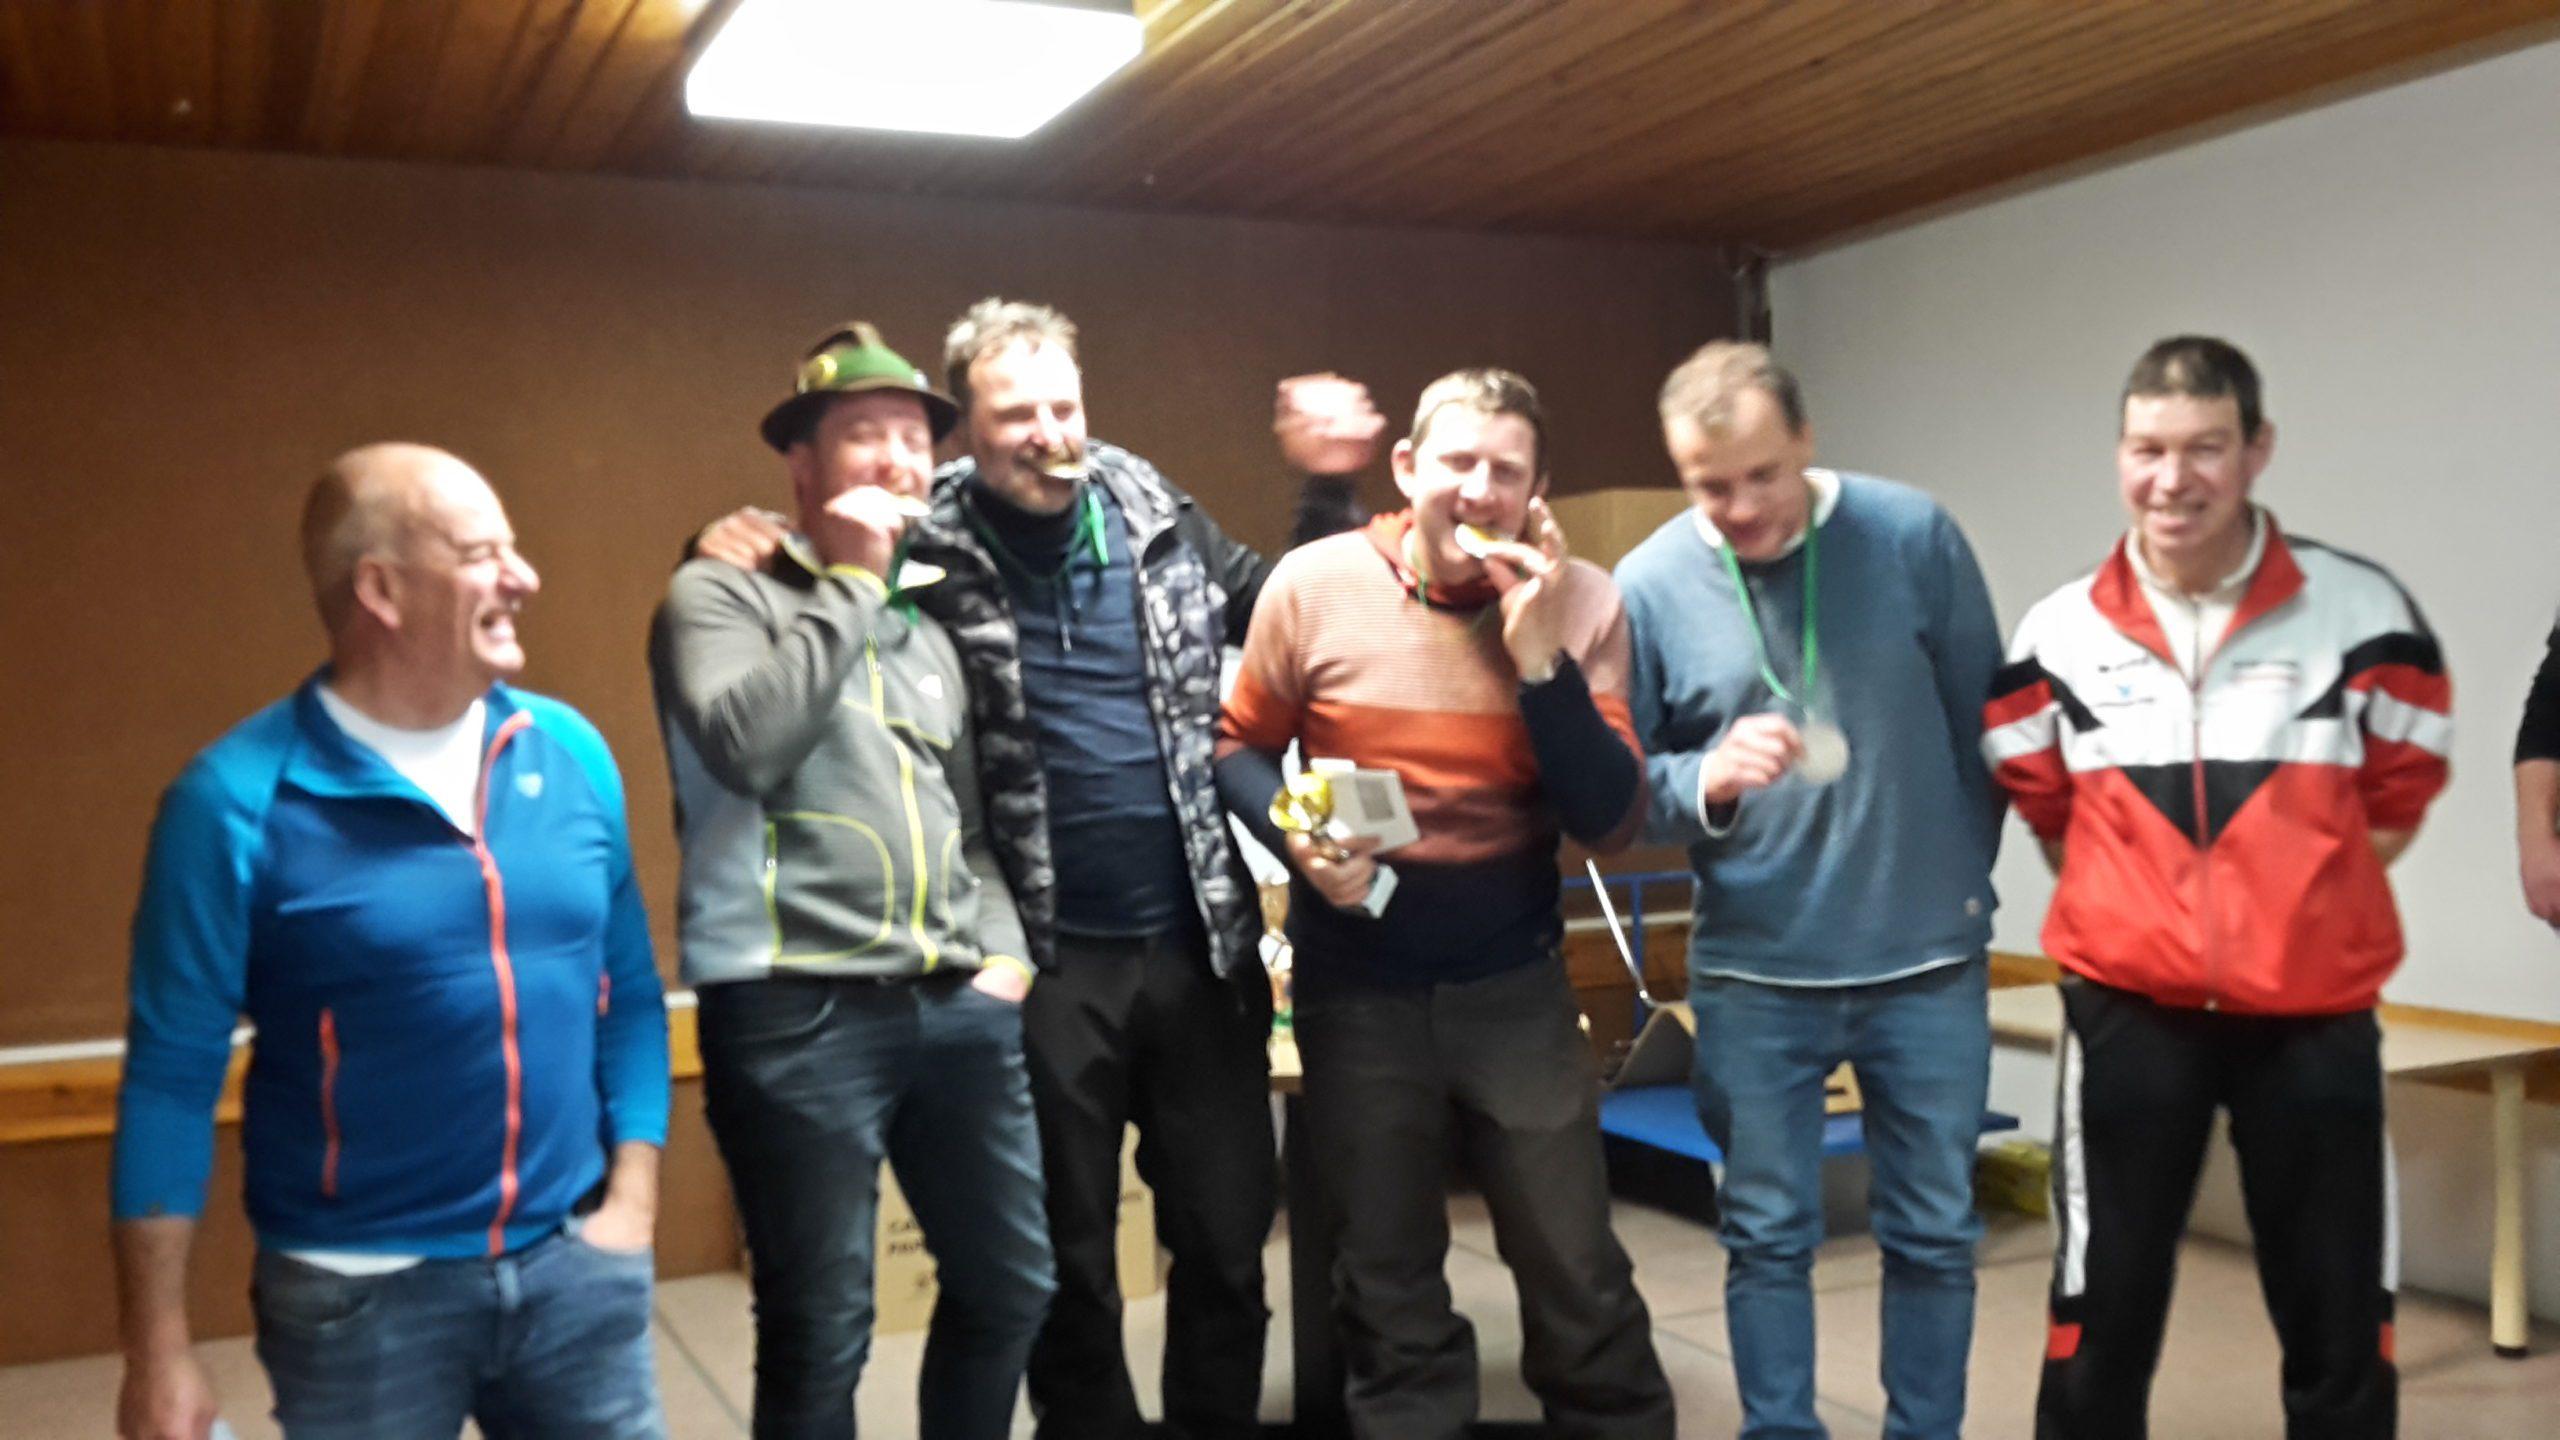 27. Dorfturnier der Eisstockschützen in Gossensaß